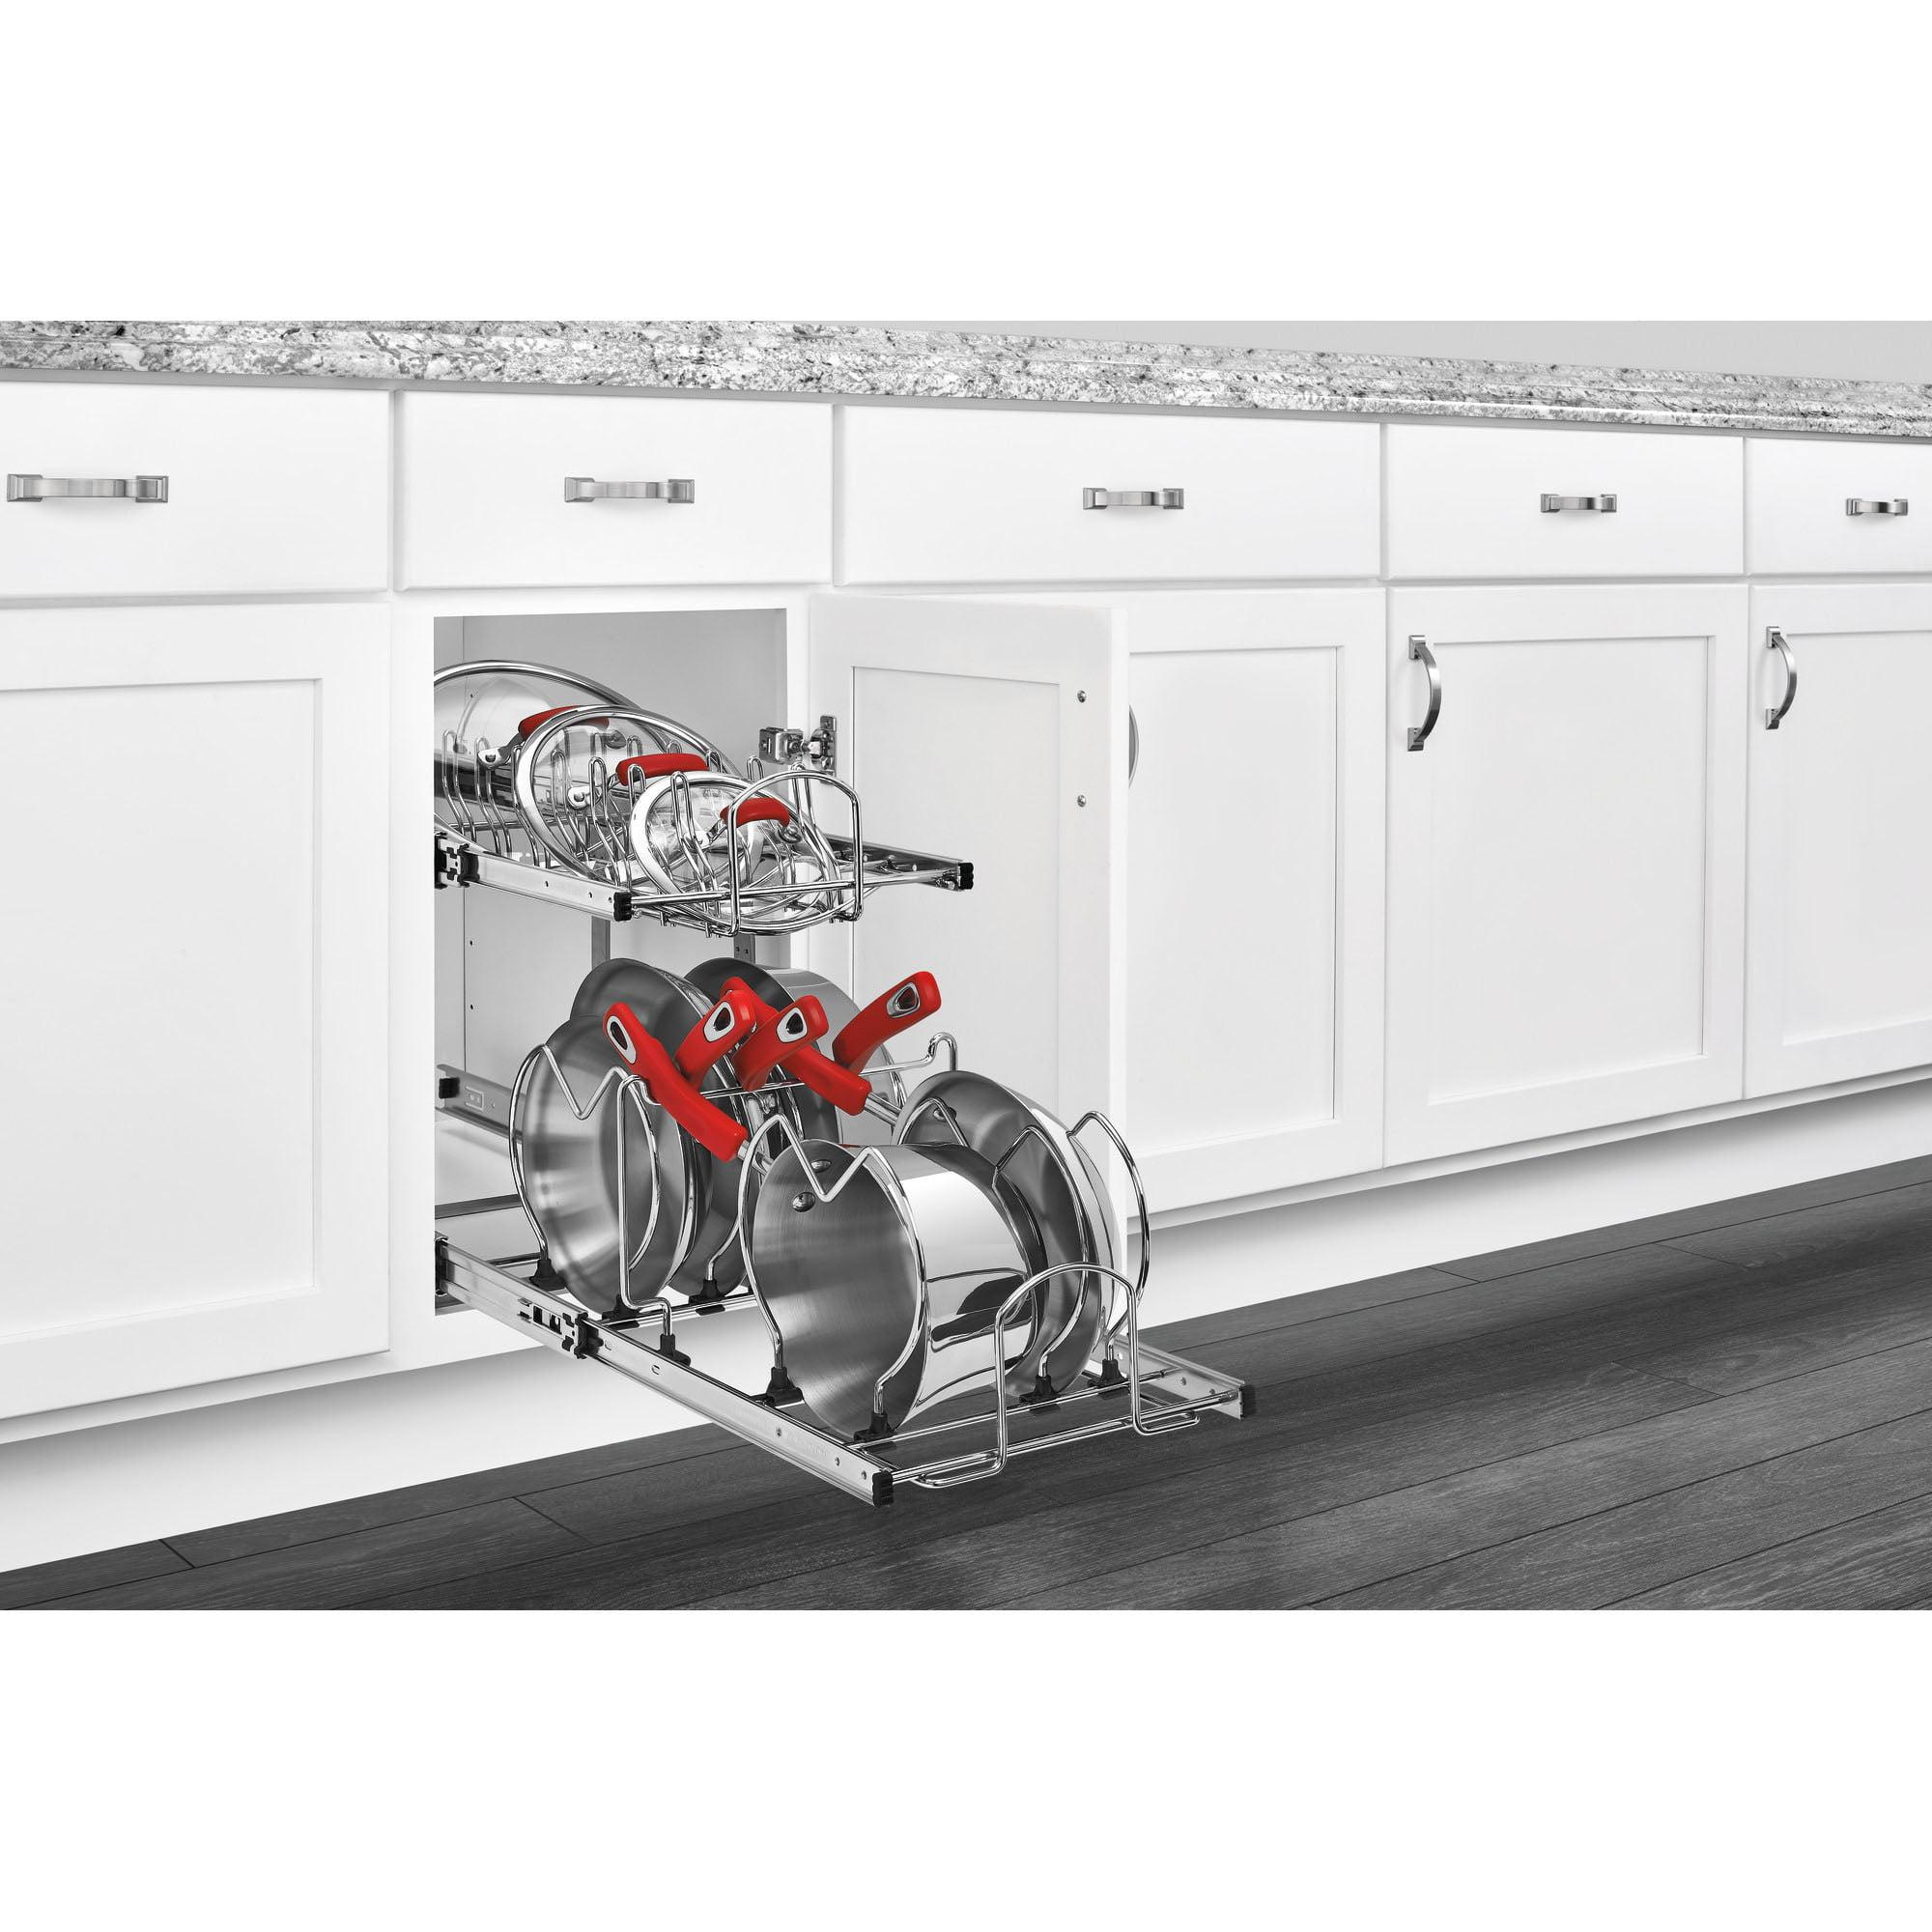 Chrome Rev-A-Shelf 5CW2-1222-CR 12 Pull-Out 2-Tier Base Cabinet Cookware Organizer